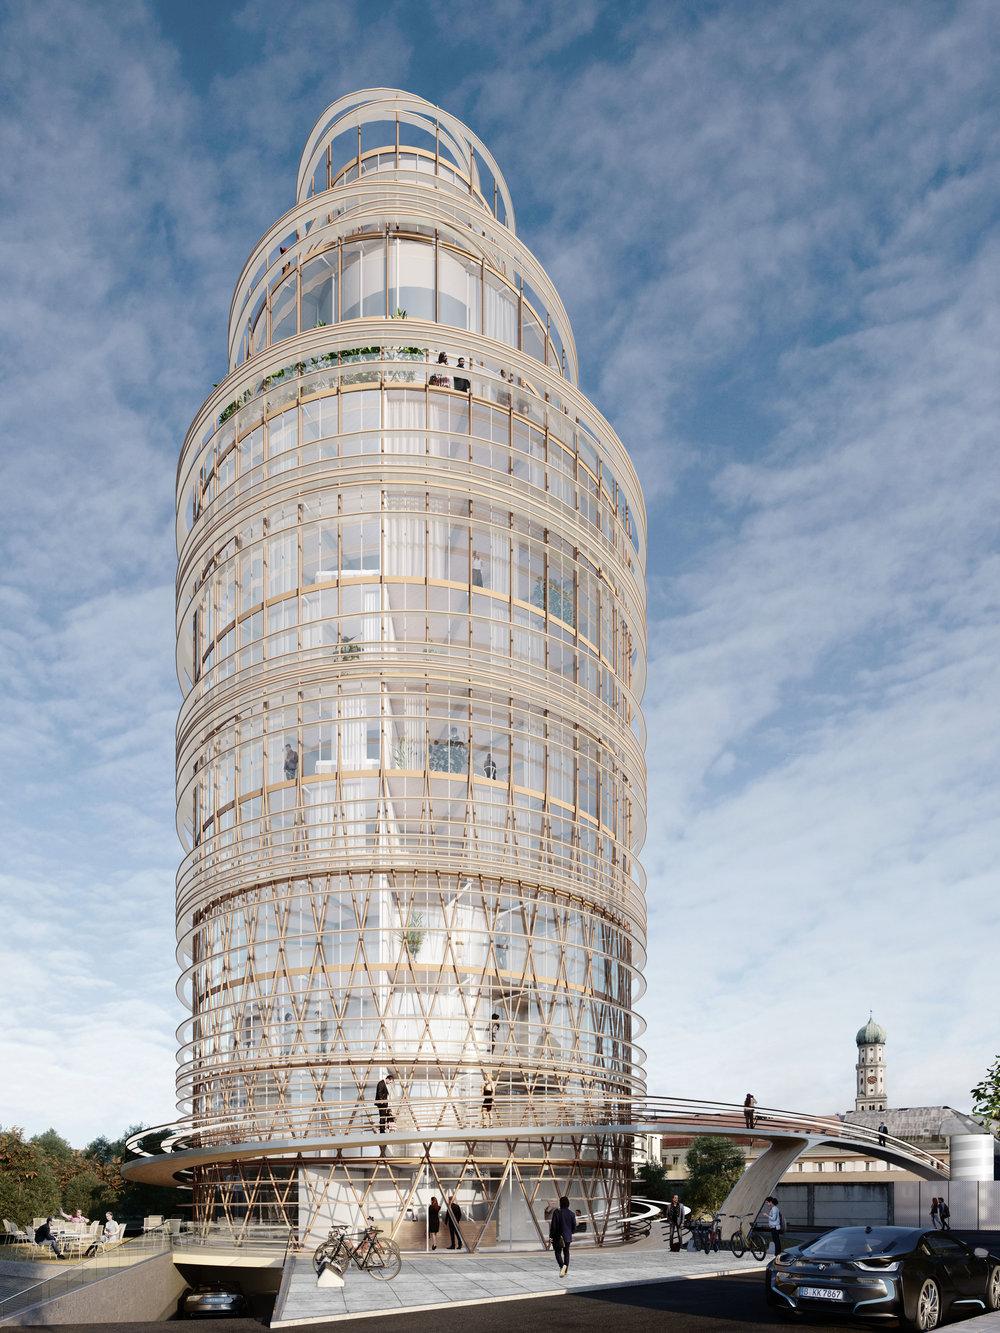 Quartertower Augsburg Germany View01.jpg